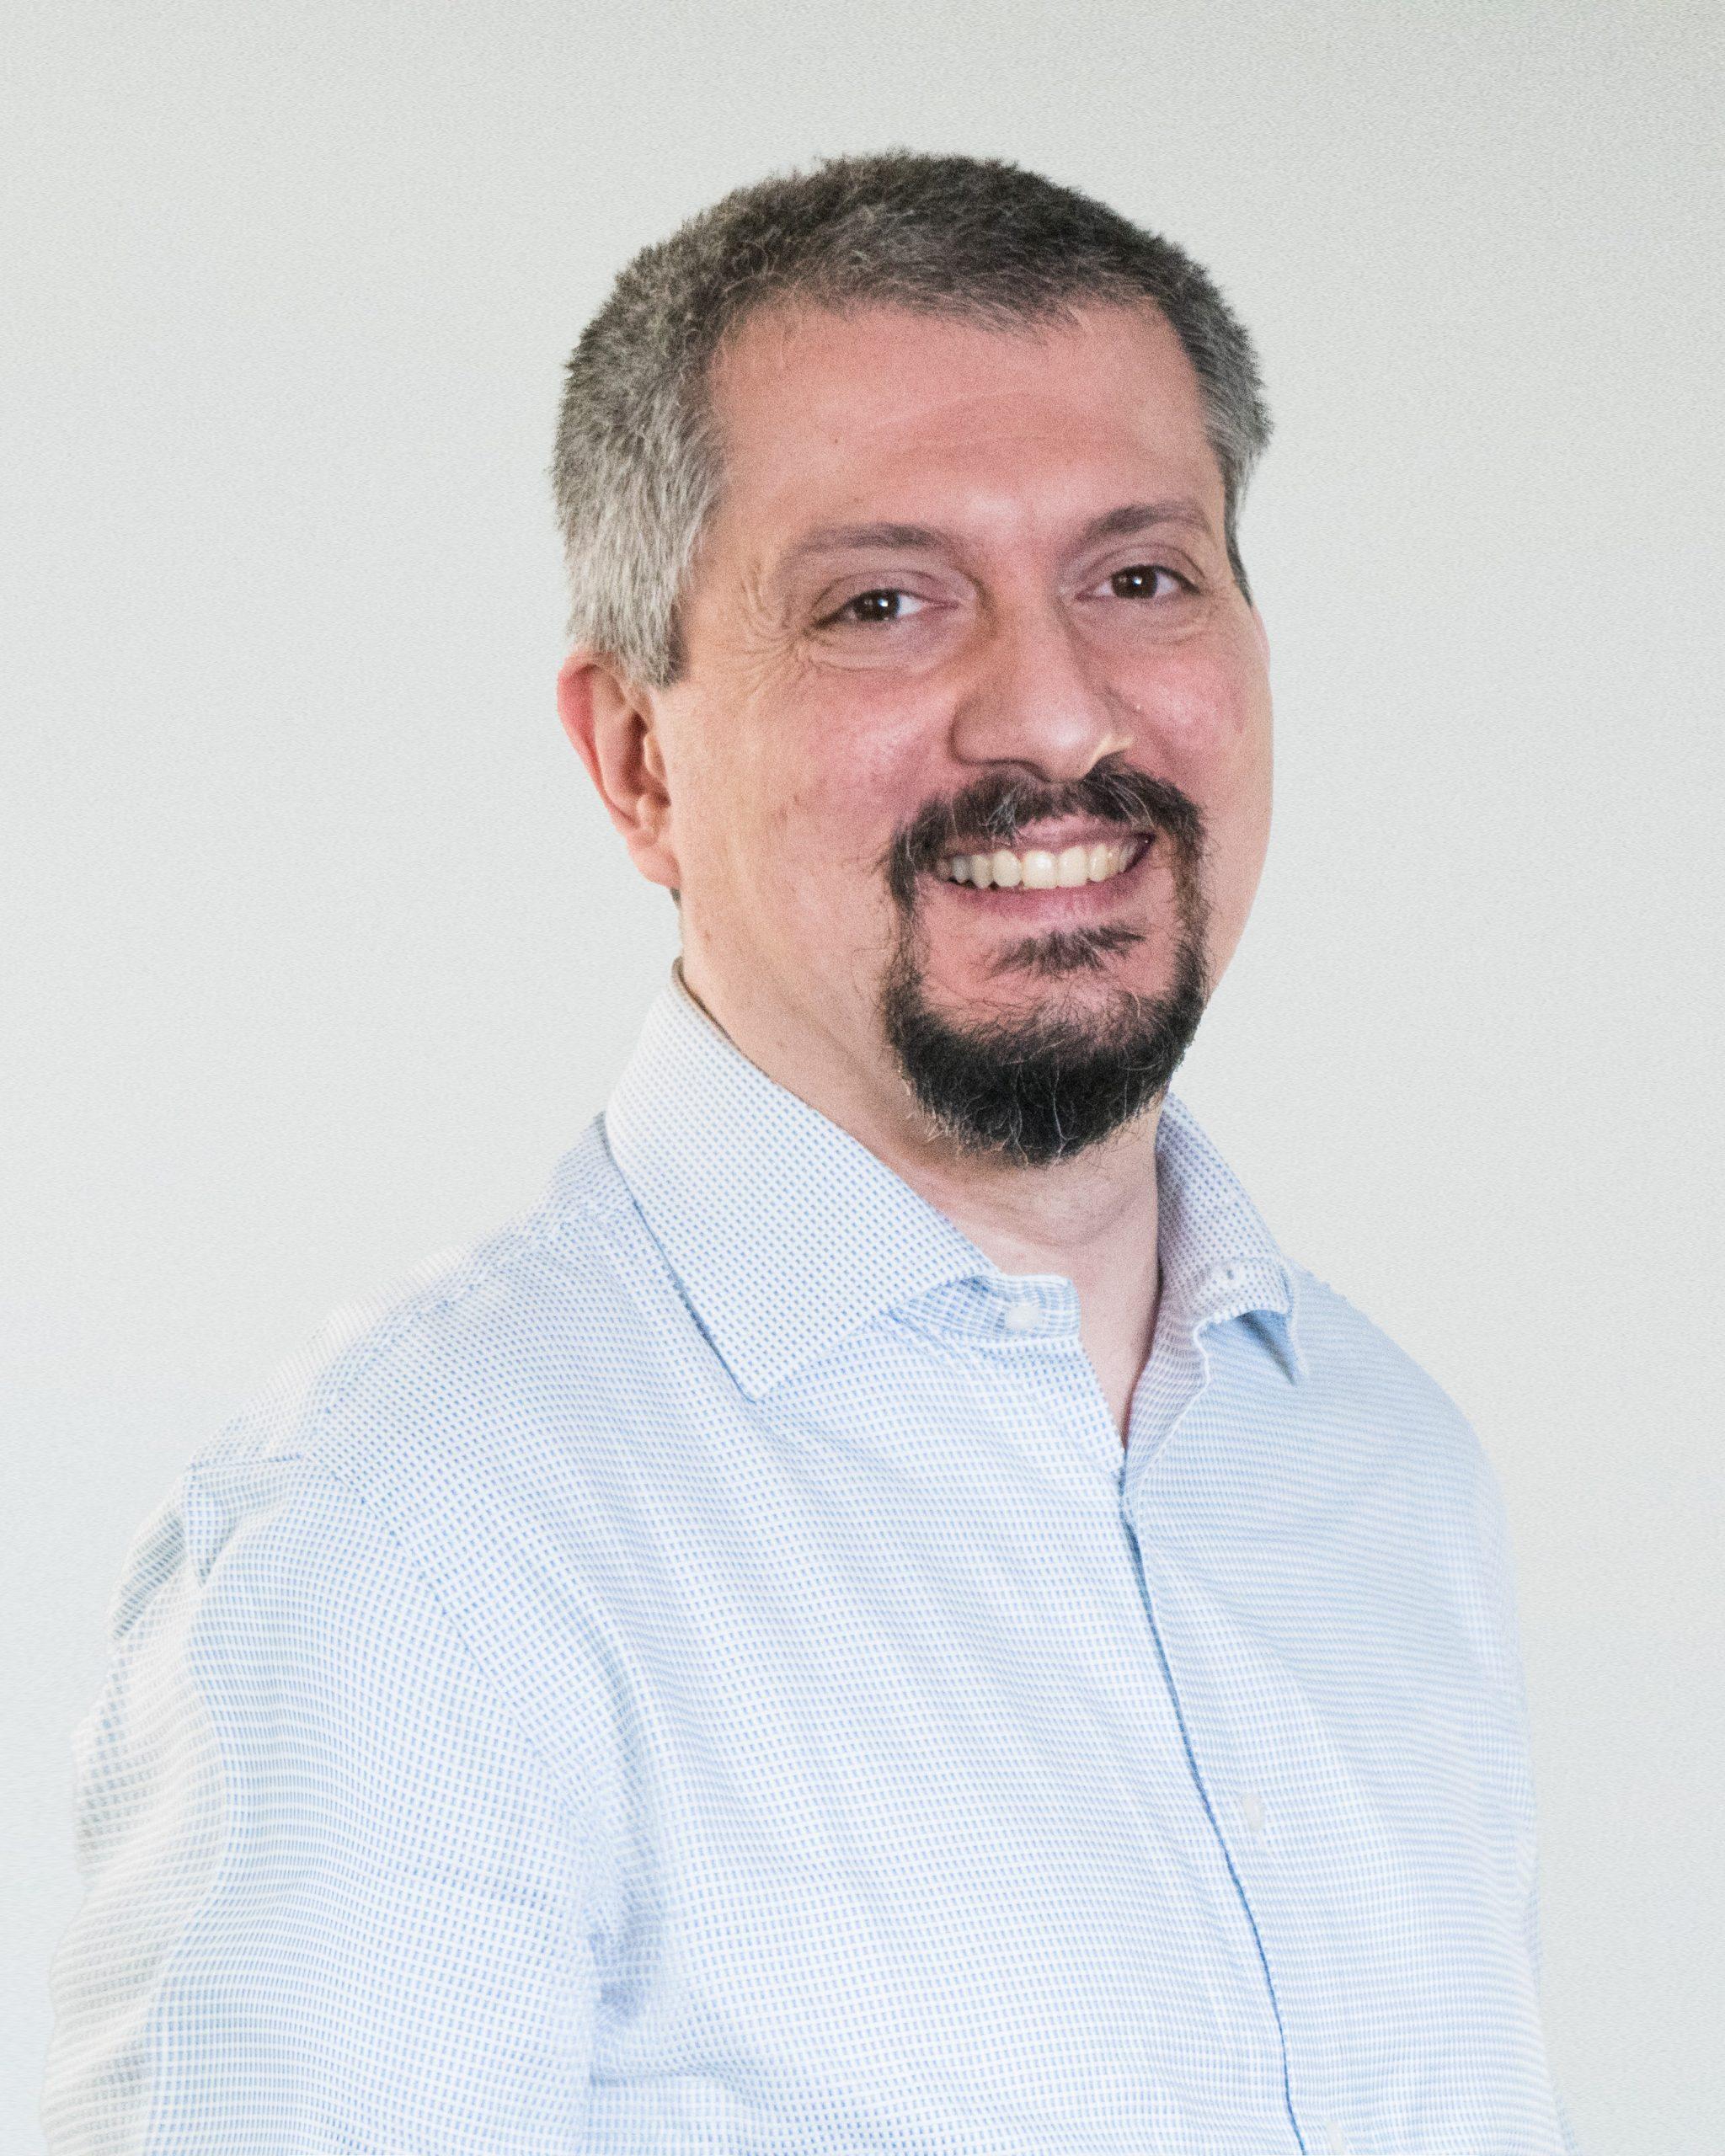 Enrico Rubinelli